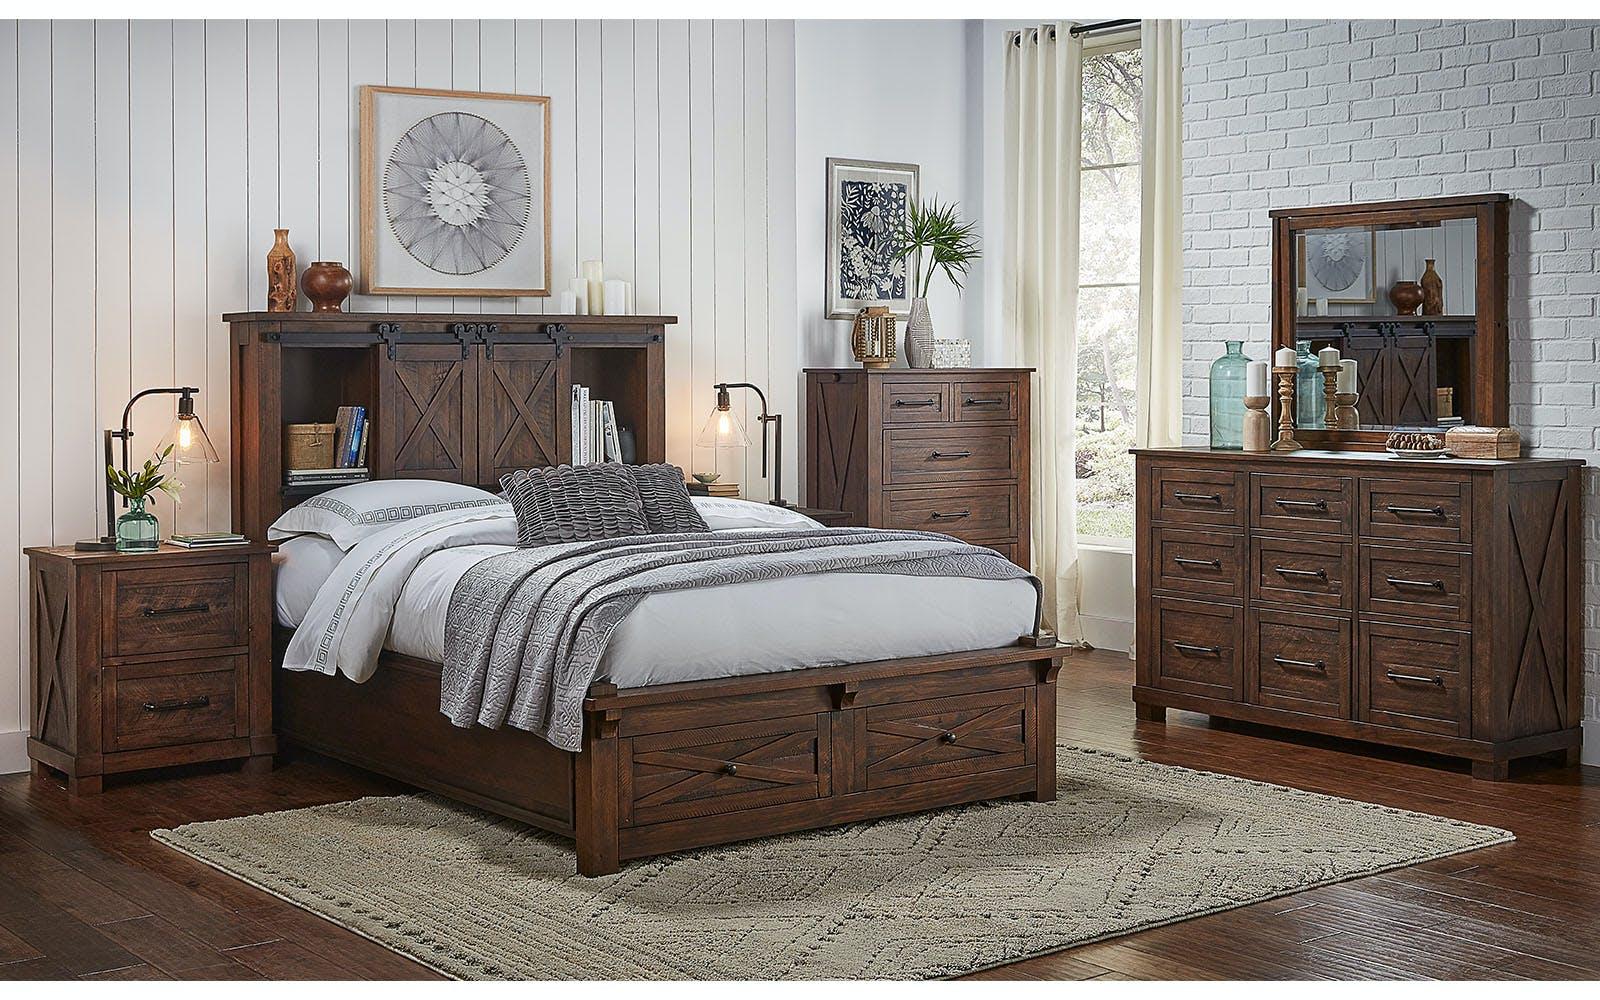 Shop Our Sun Valley Rustic Solid Pine Storage Headboard W 2 Drawer Storage Footboard Dresser